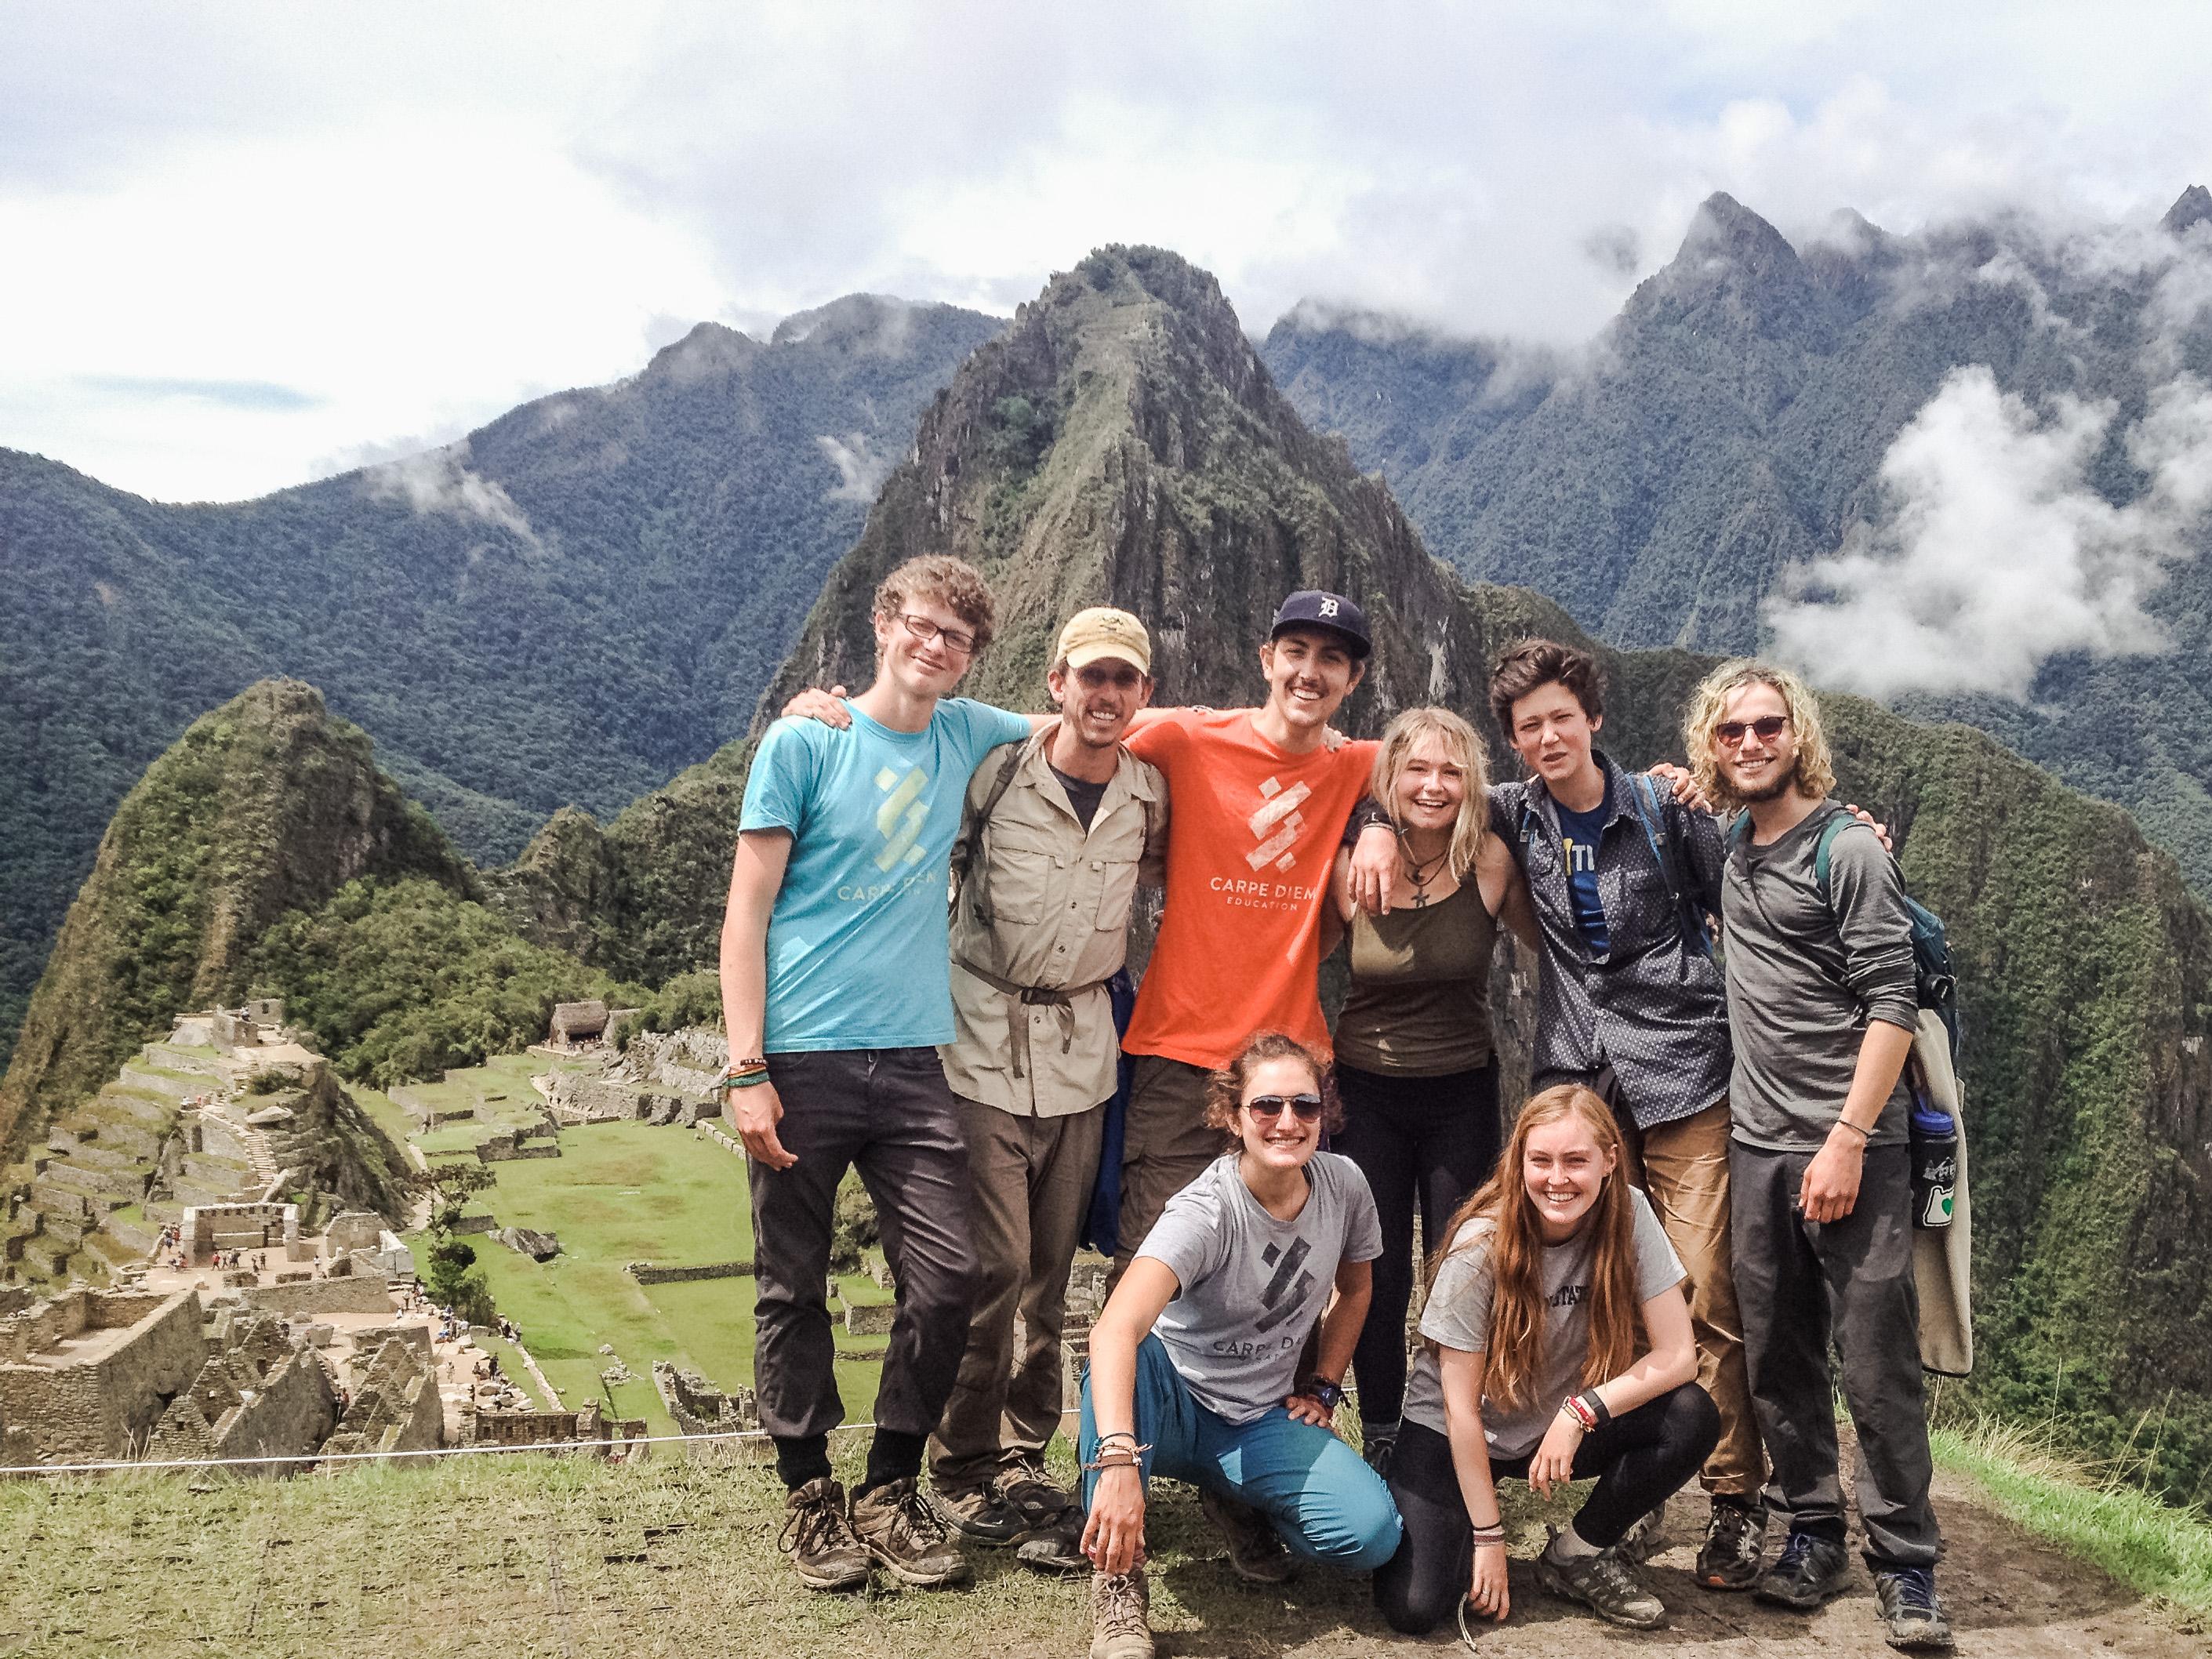 Gap Year Program - Carpe Diem Education | South America Semester: Spanish Immersion & Conservation  2